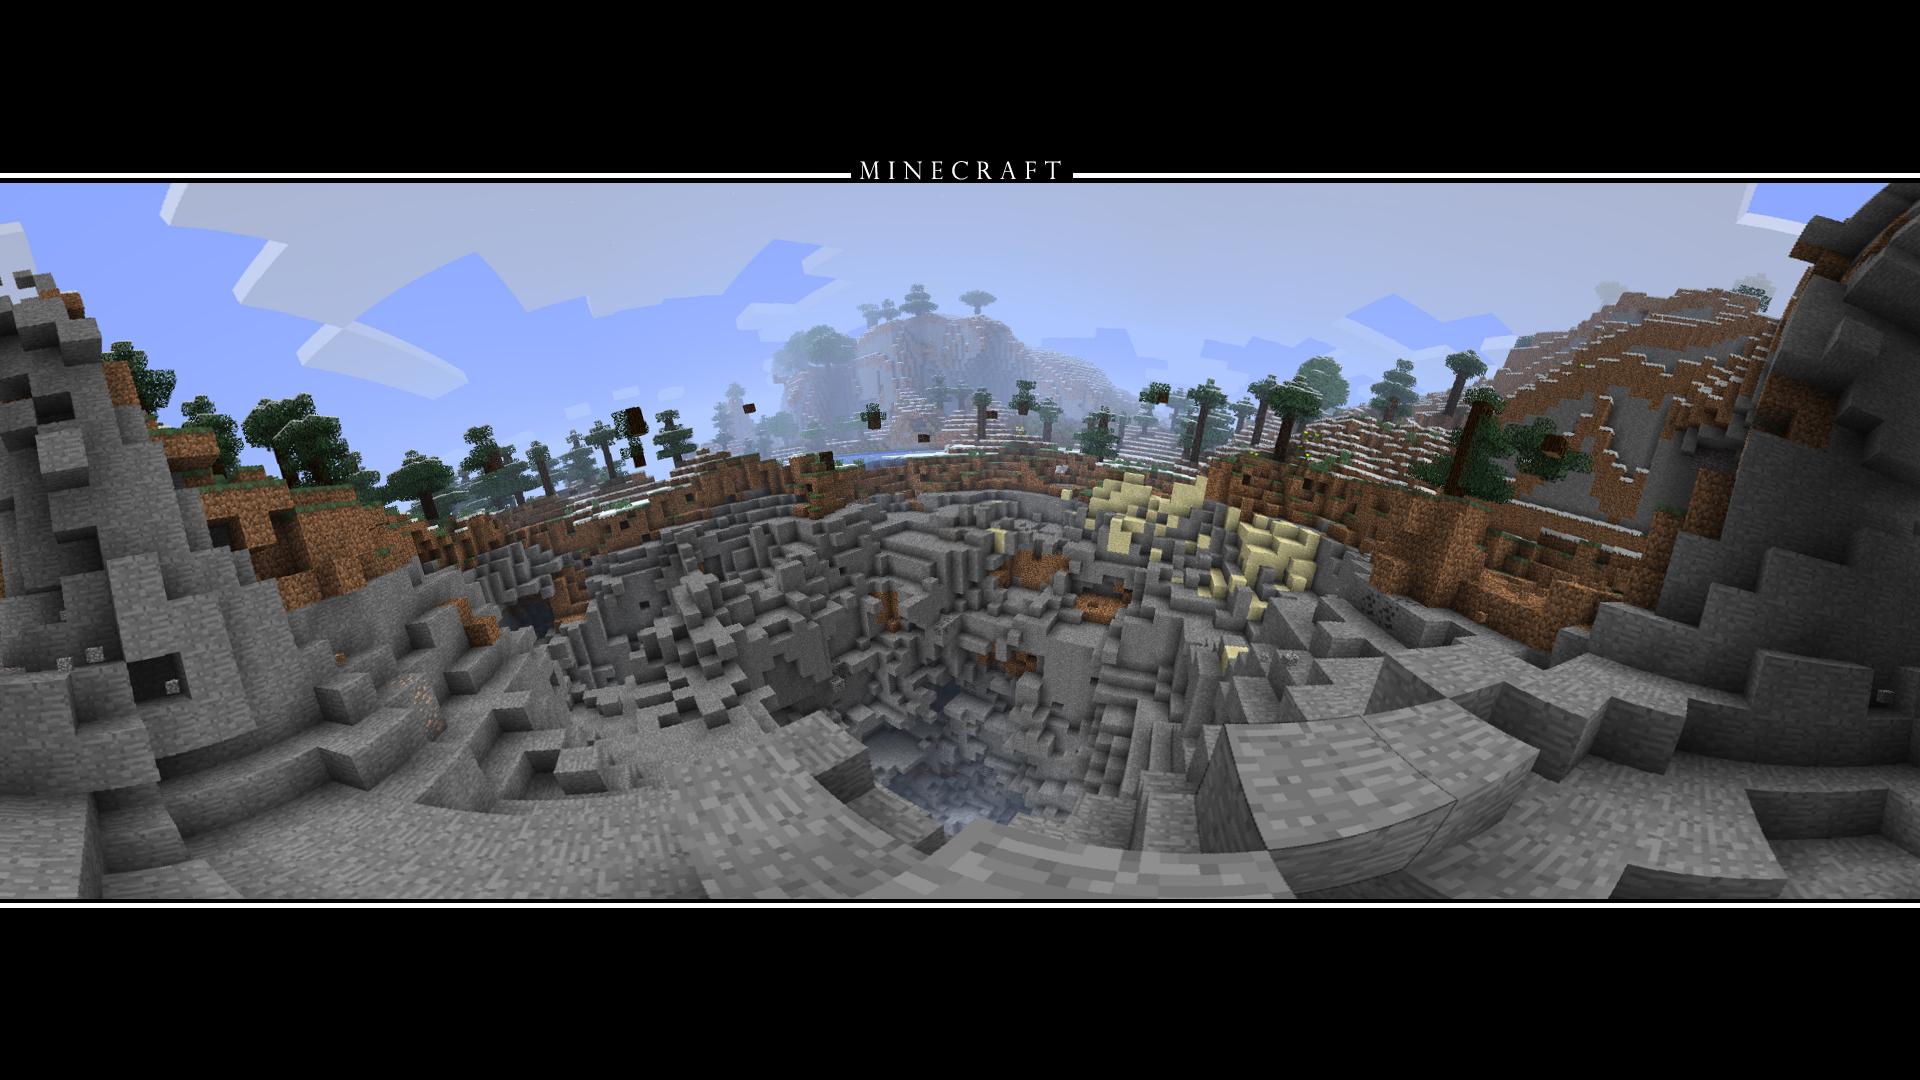 Minecraft Crater Wallpaper HD by drblackjack27